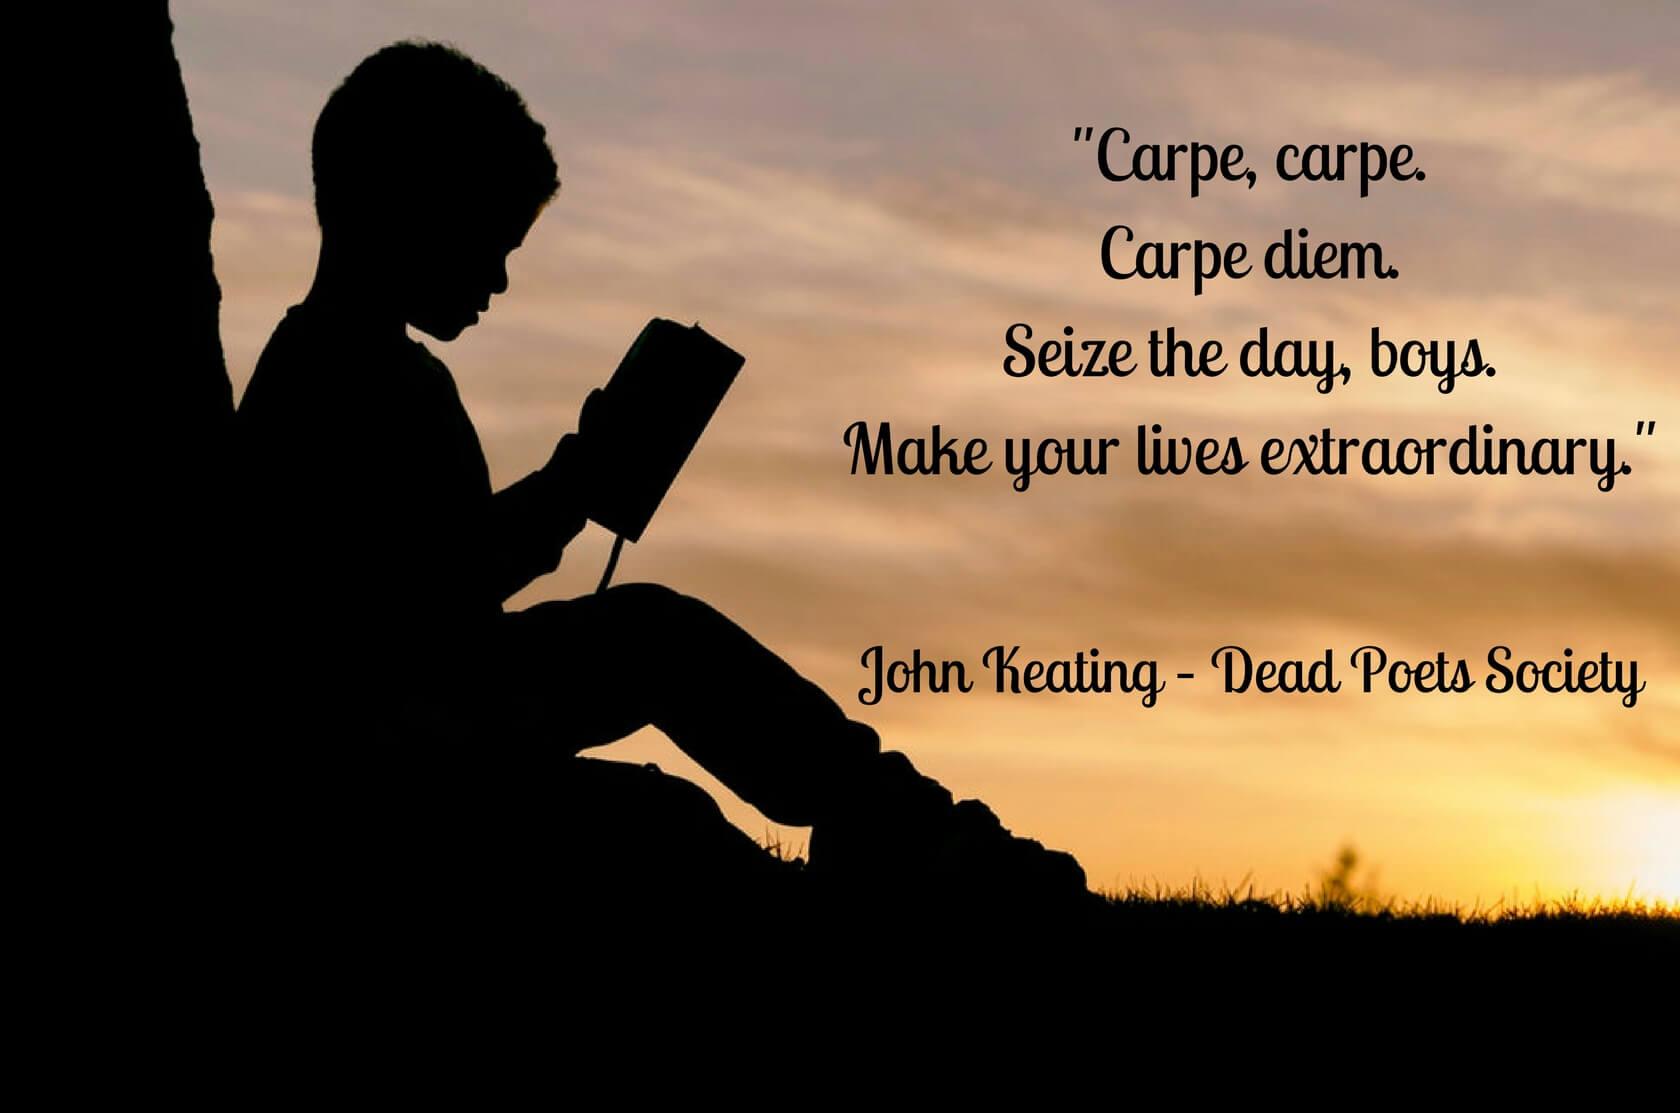 carpe-diem-john-keating-dead-poets-society